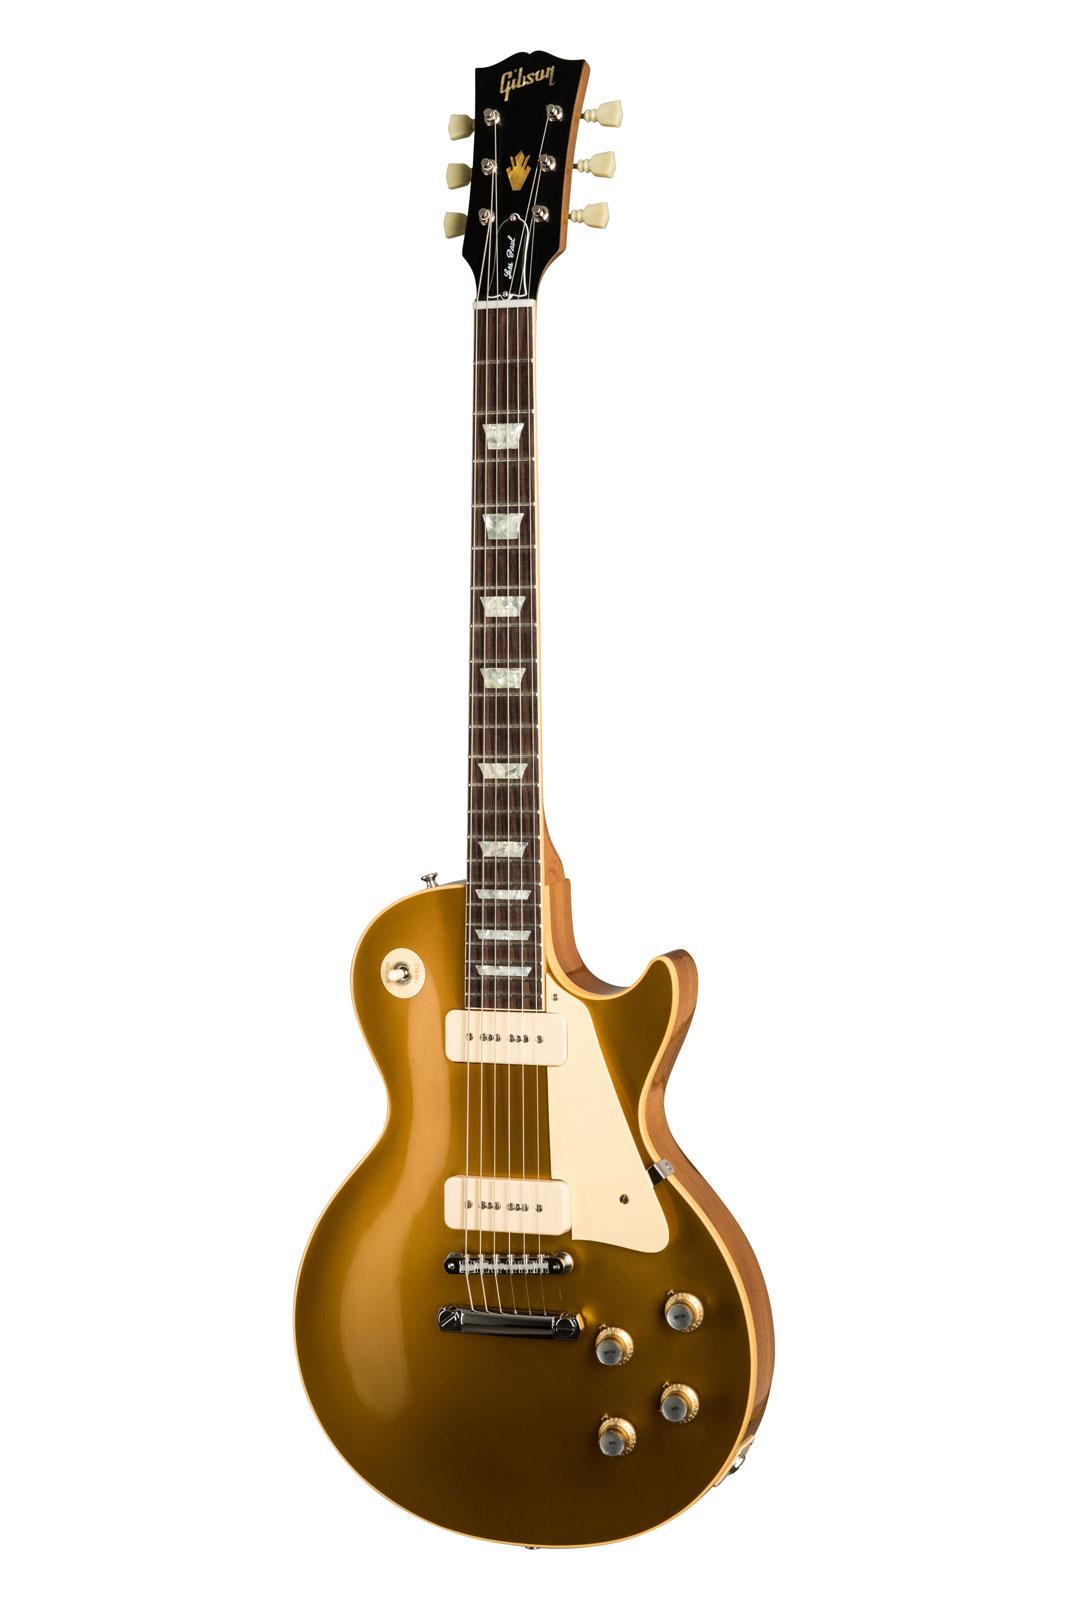 Gibson 1968 Les Paul Standard Goldtop Reissue Gloss 60s Gold